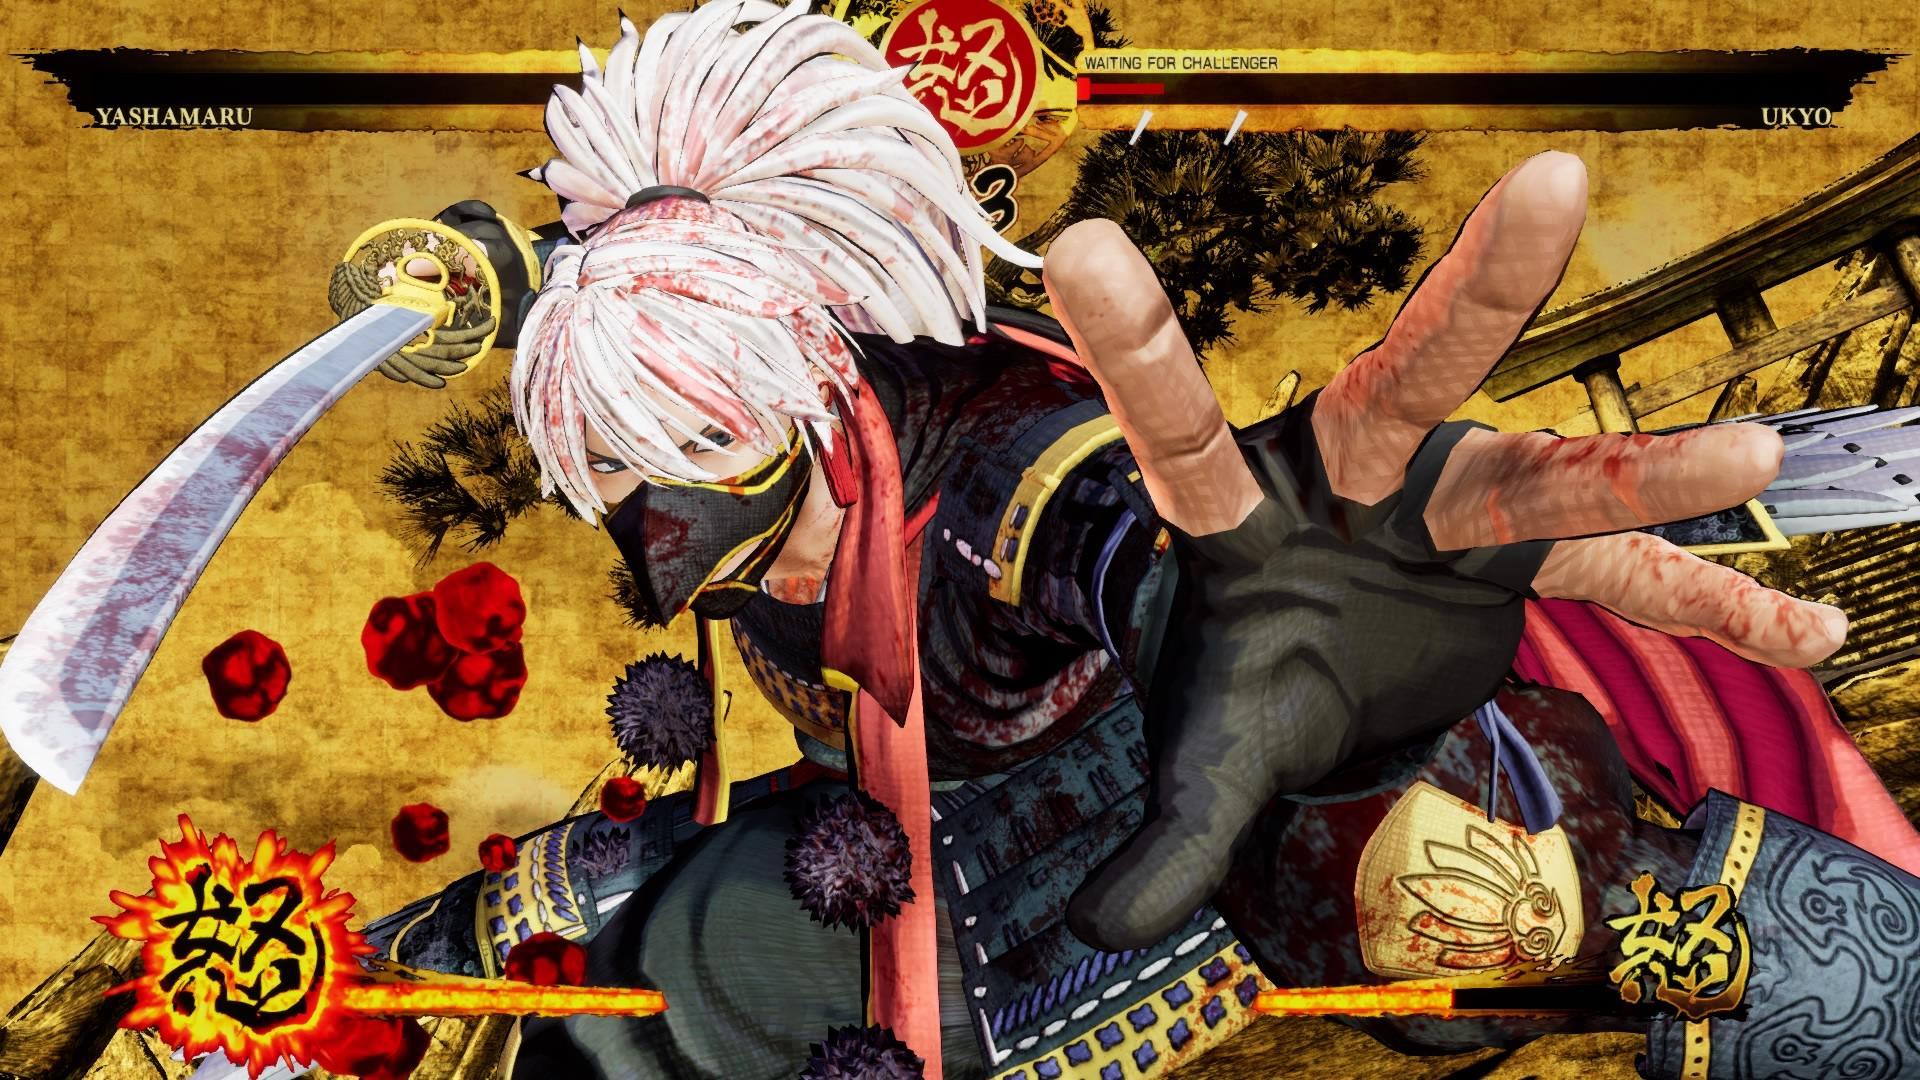 How are you liking Samurai Shodown? screenshot